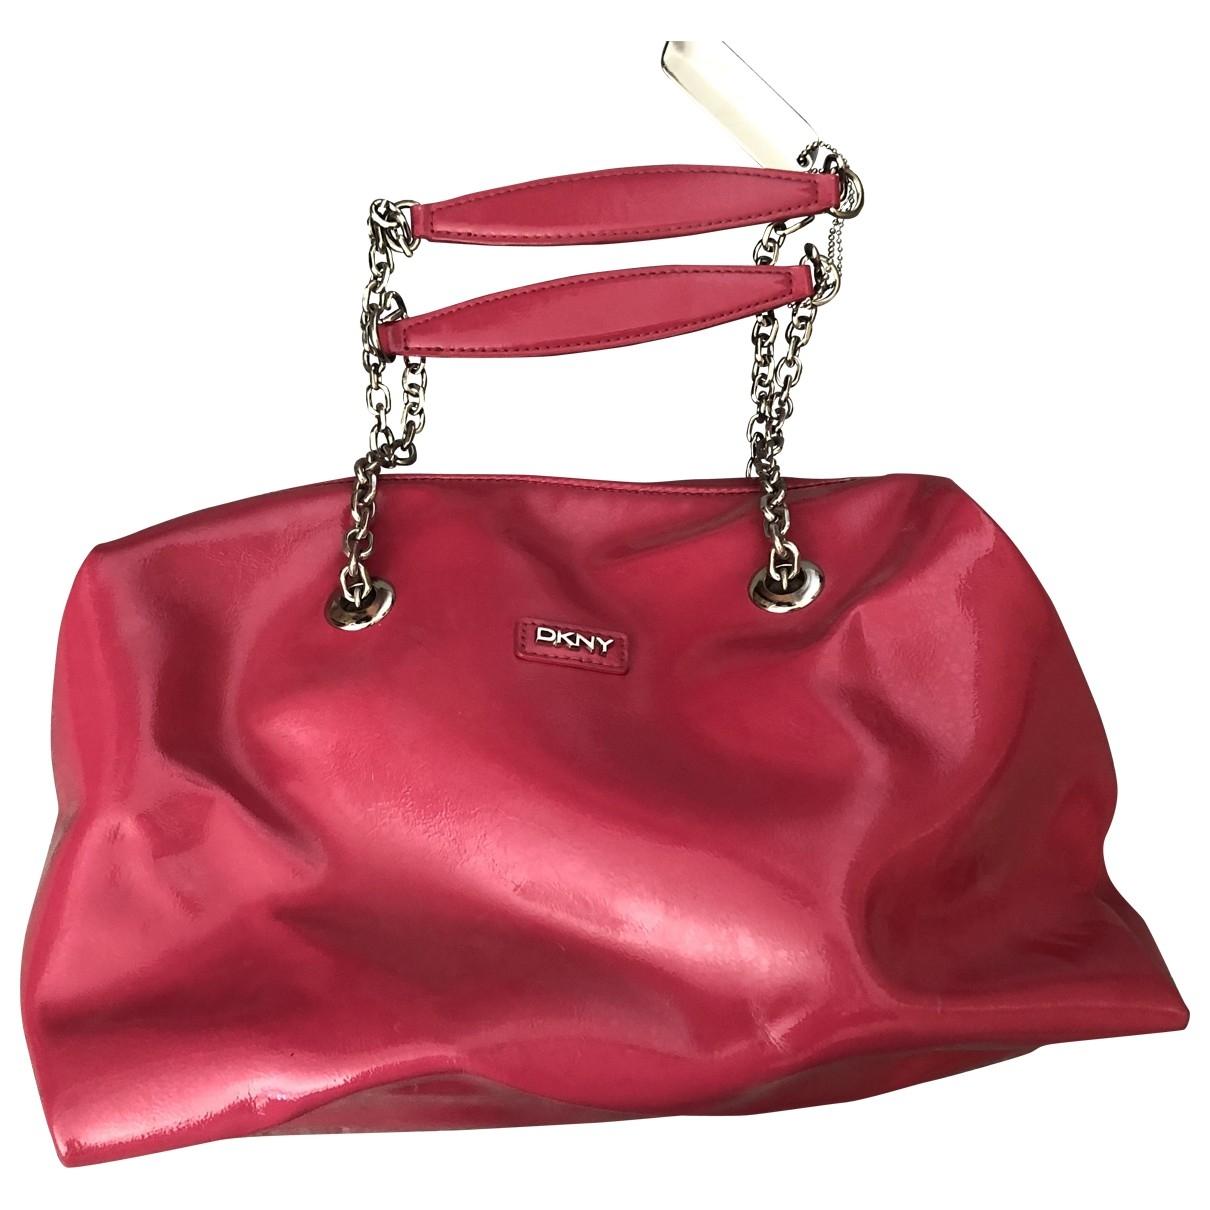 Dkny \N Pink Leather handbag for Women \N